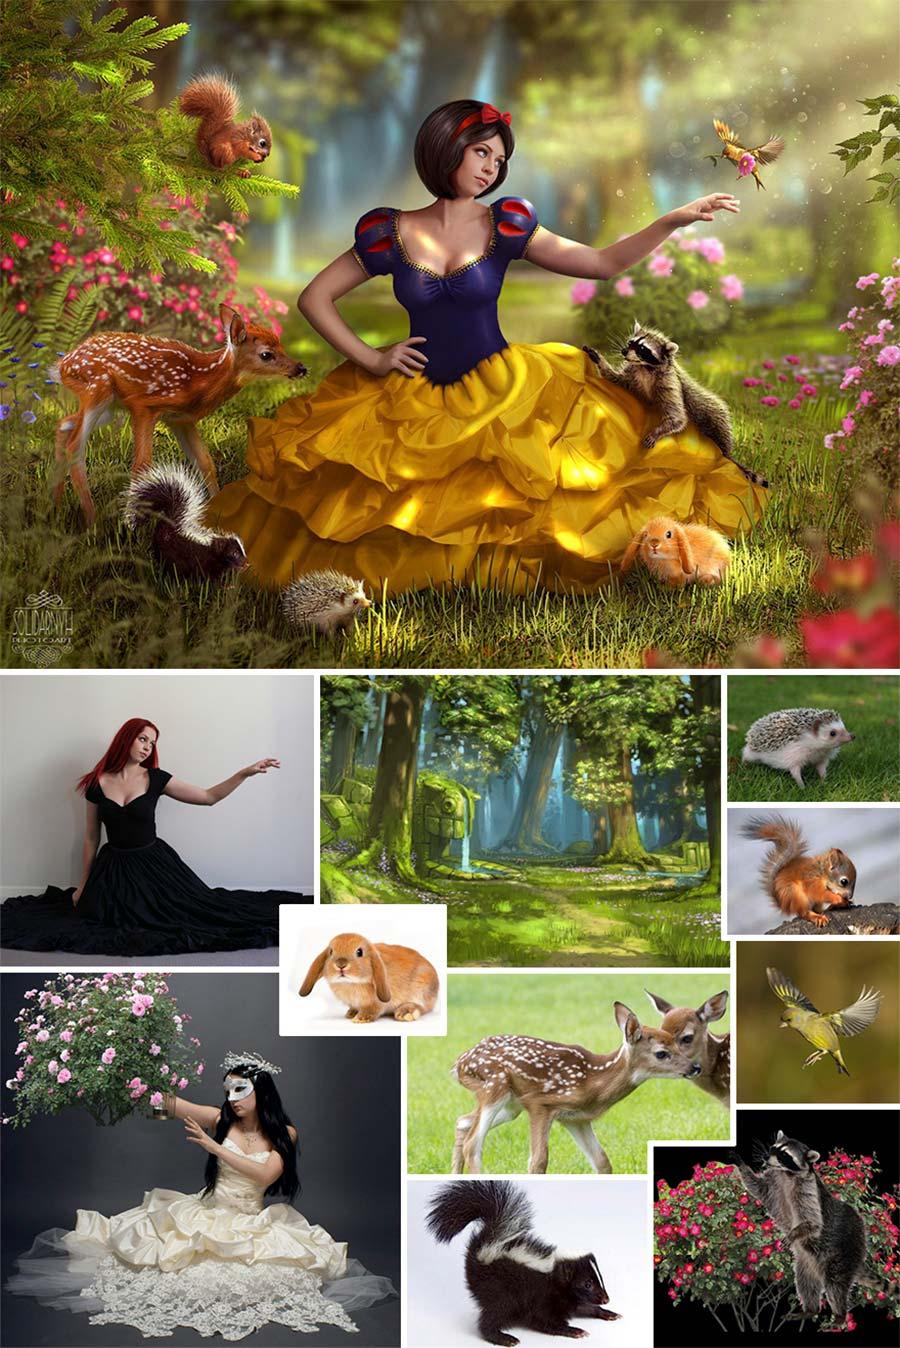 Photoshop-Skills von Viktoria Solidarnyh photoshop-skills-Viktoria-Solidarnyh_08